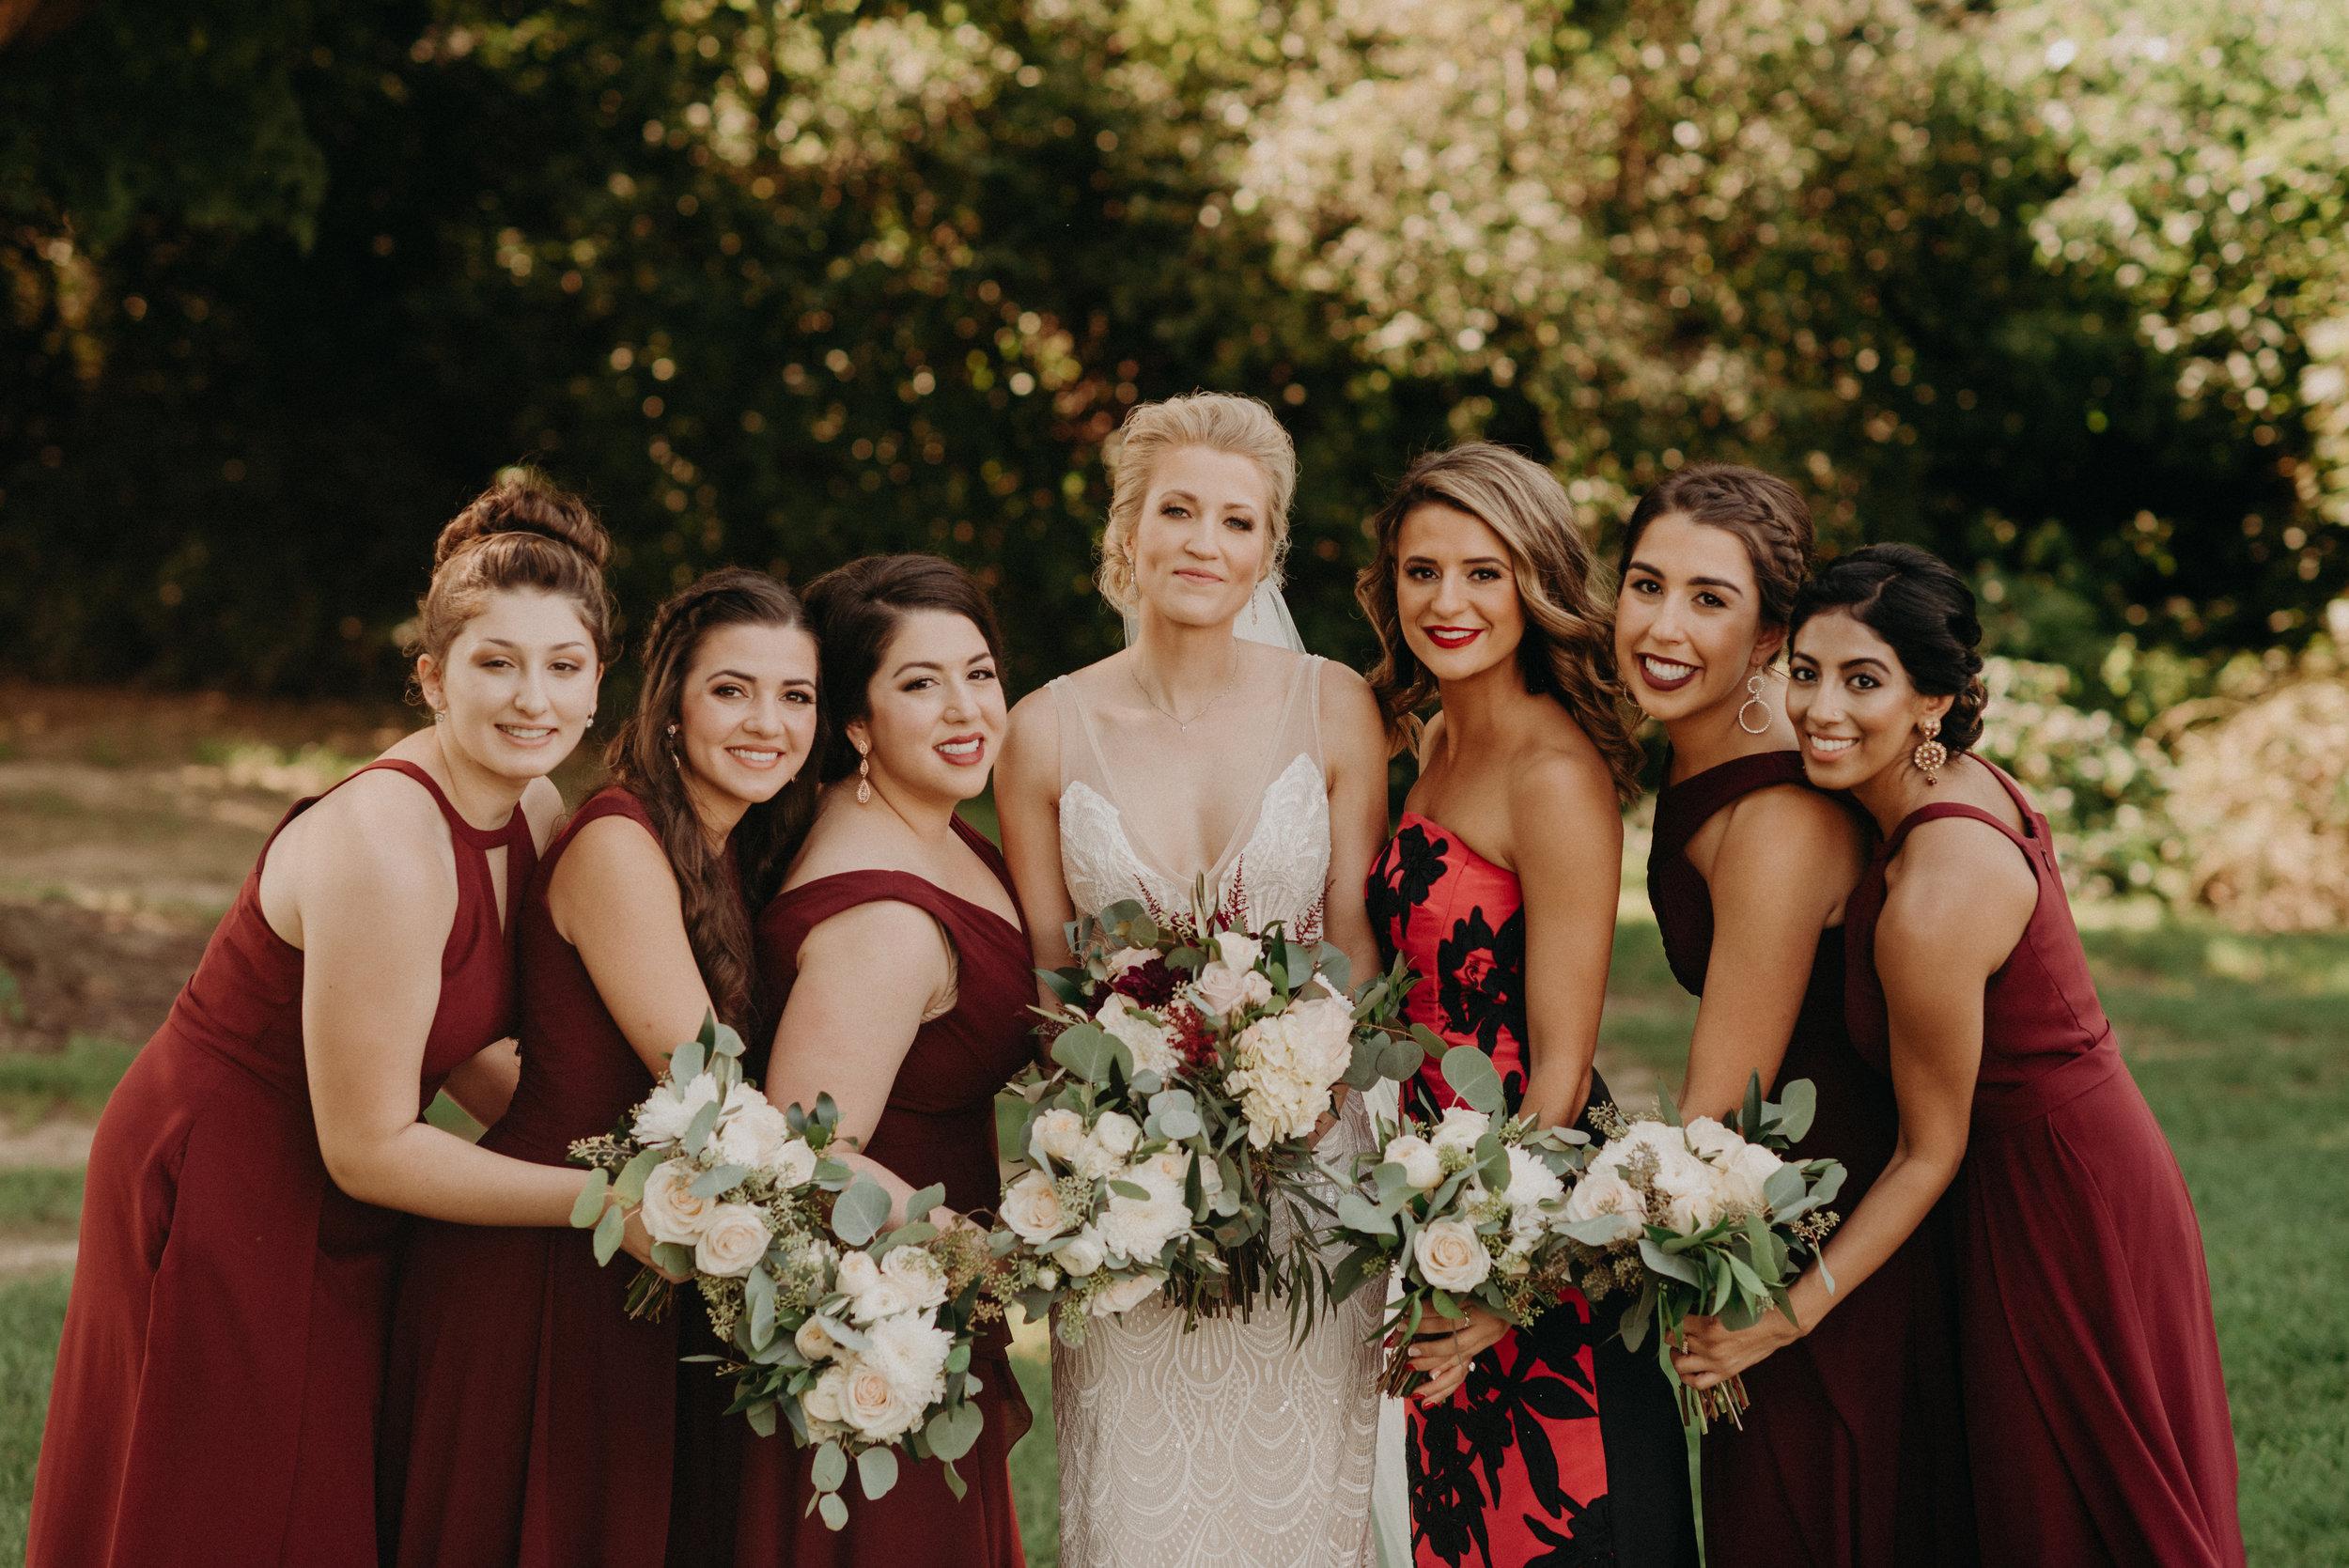 Bridesmaids Photos from Moline, Illinois + Bettendorf, Iowa Wedding Day Photographer